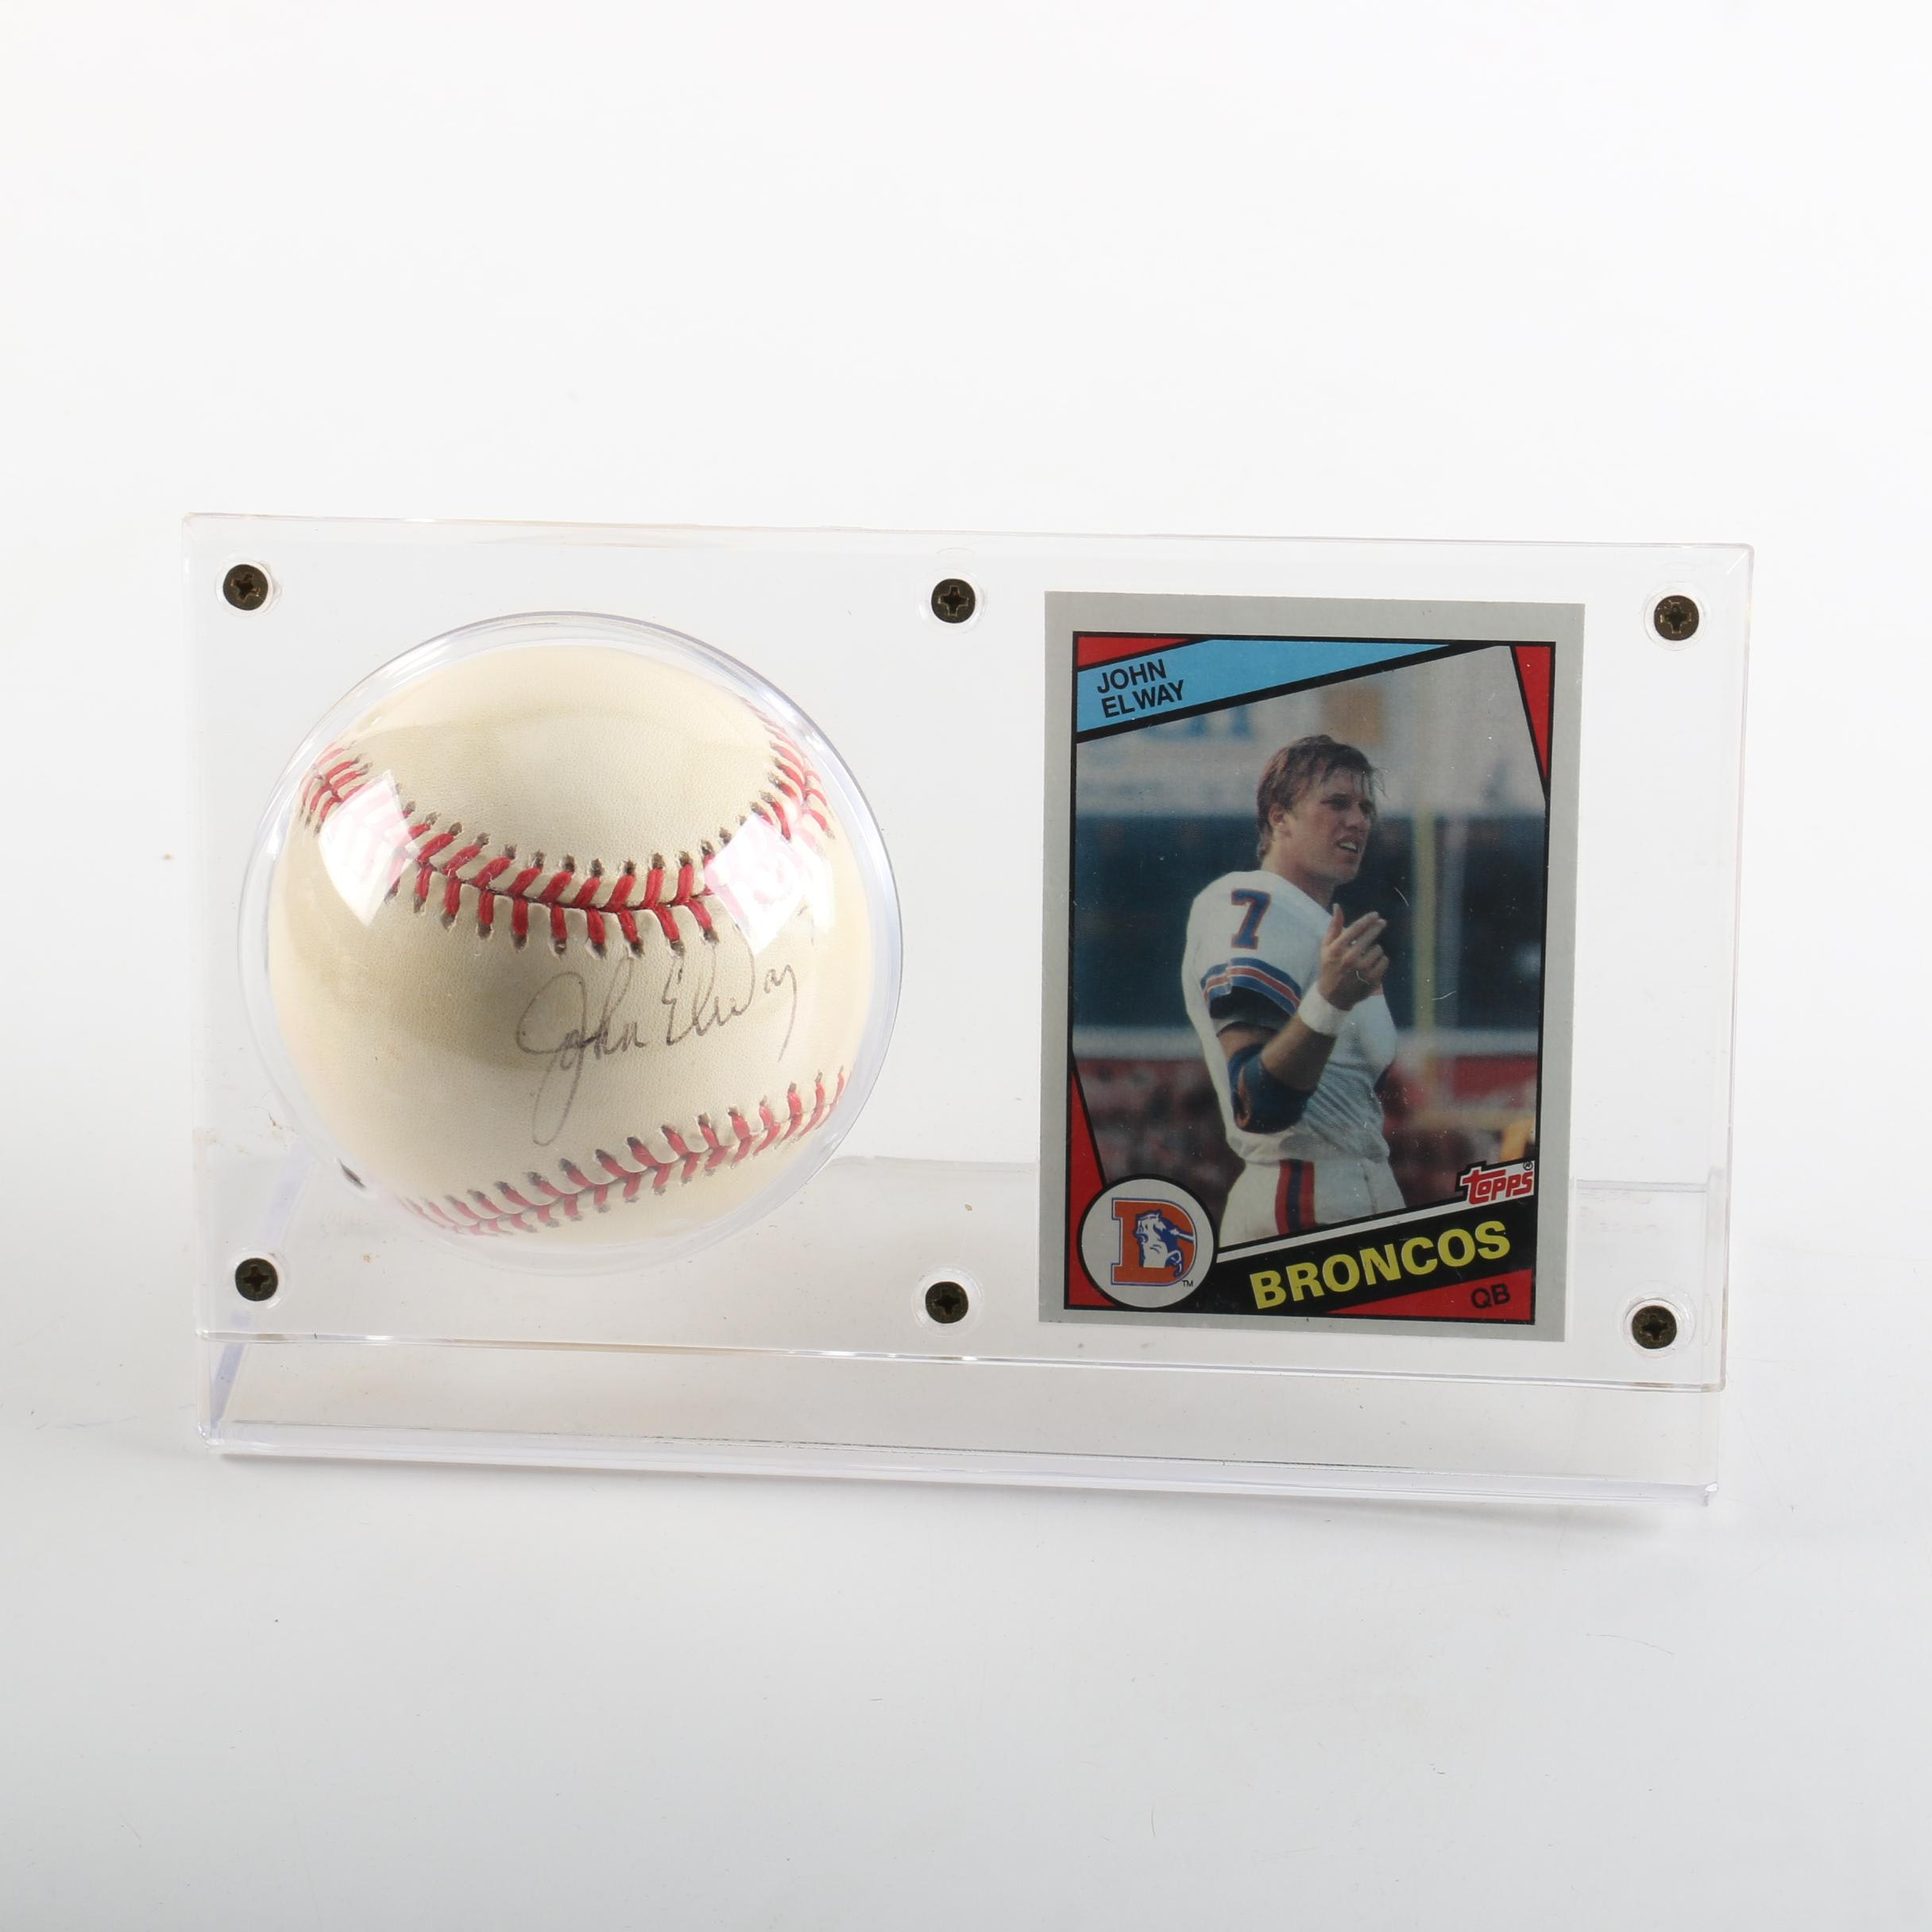 John Elway Autographed Baseball and Football Trading Card